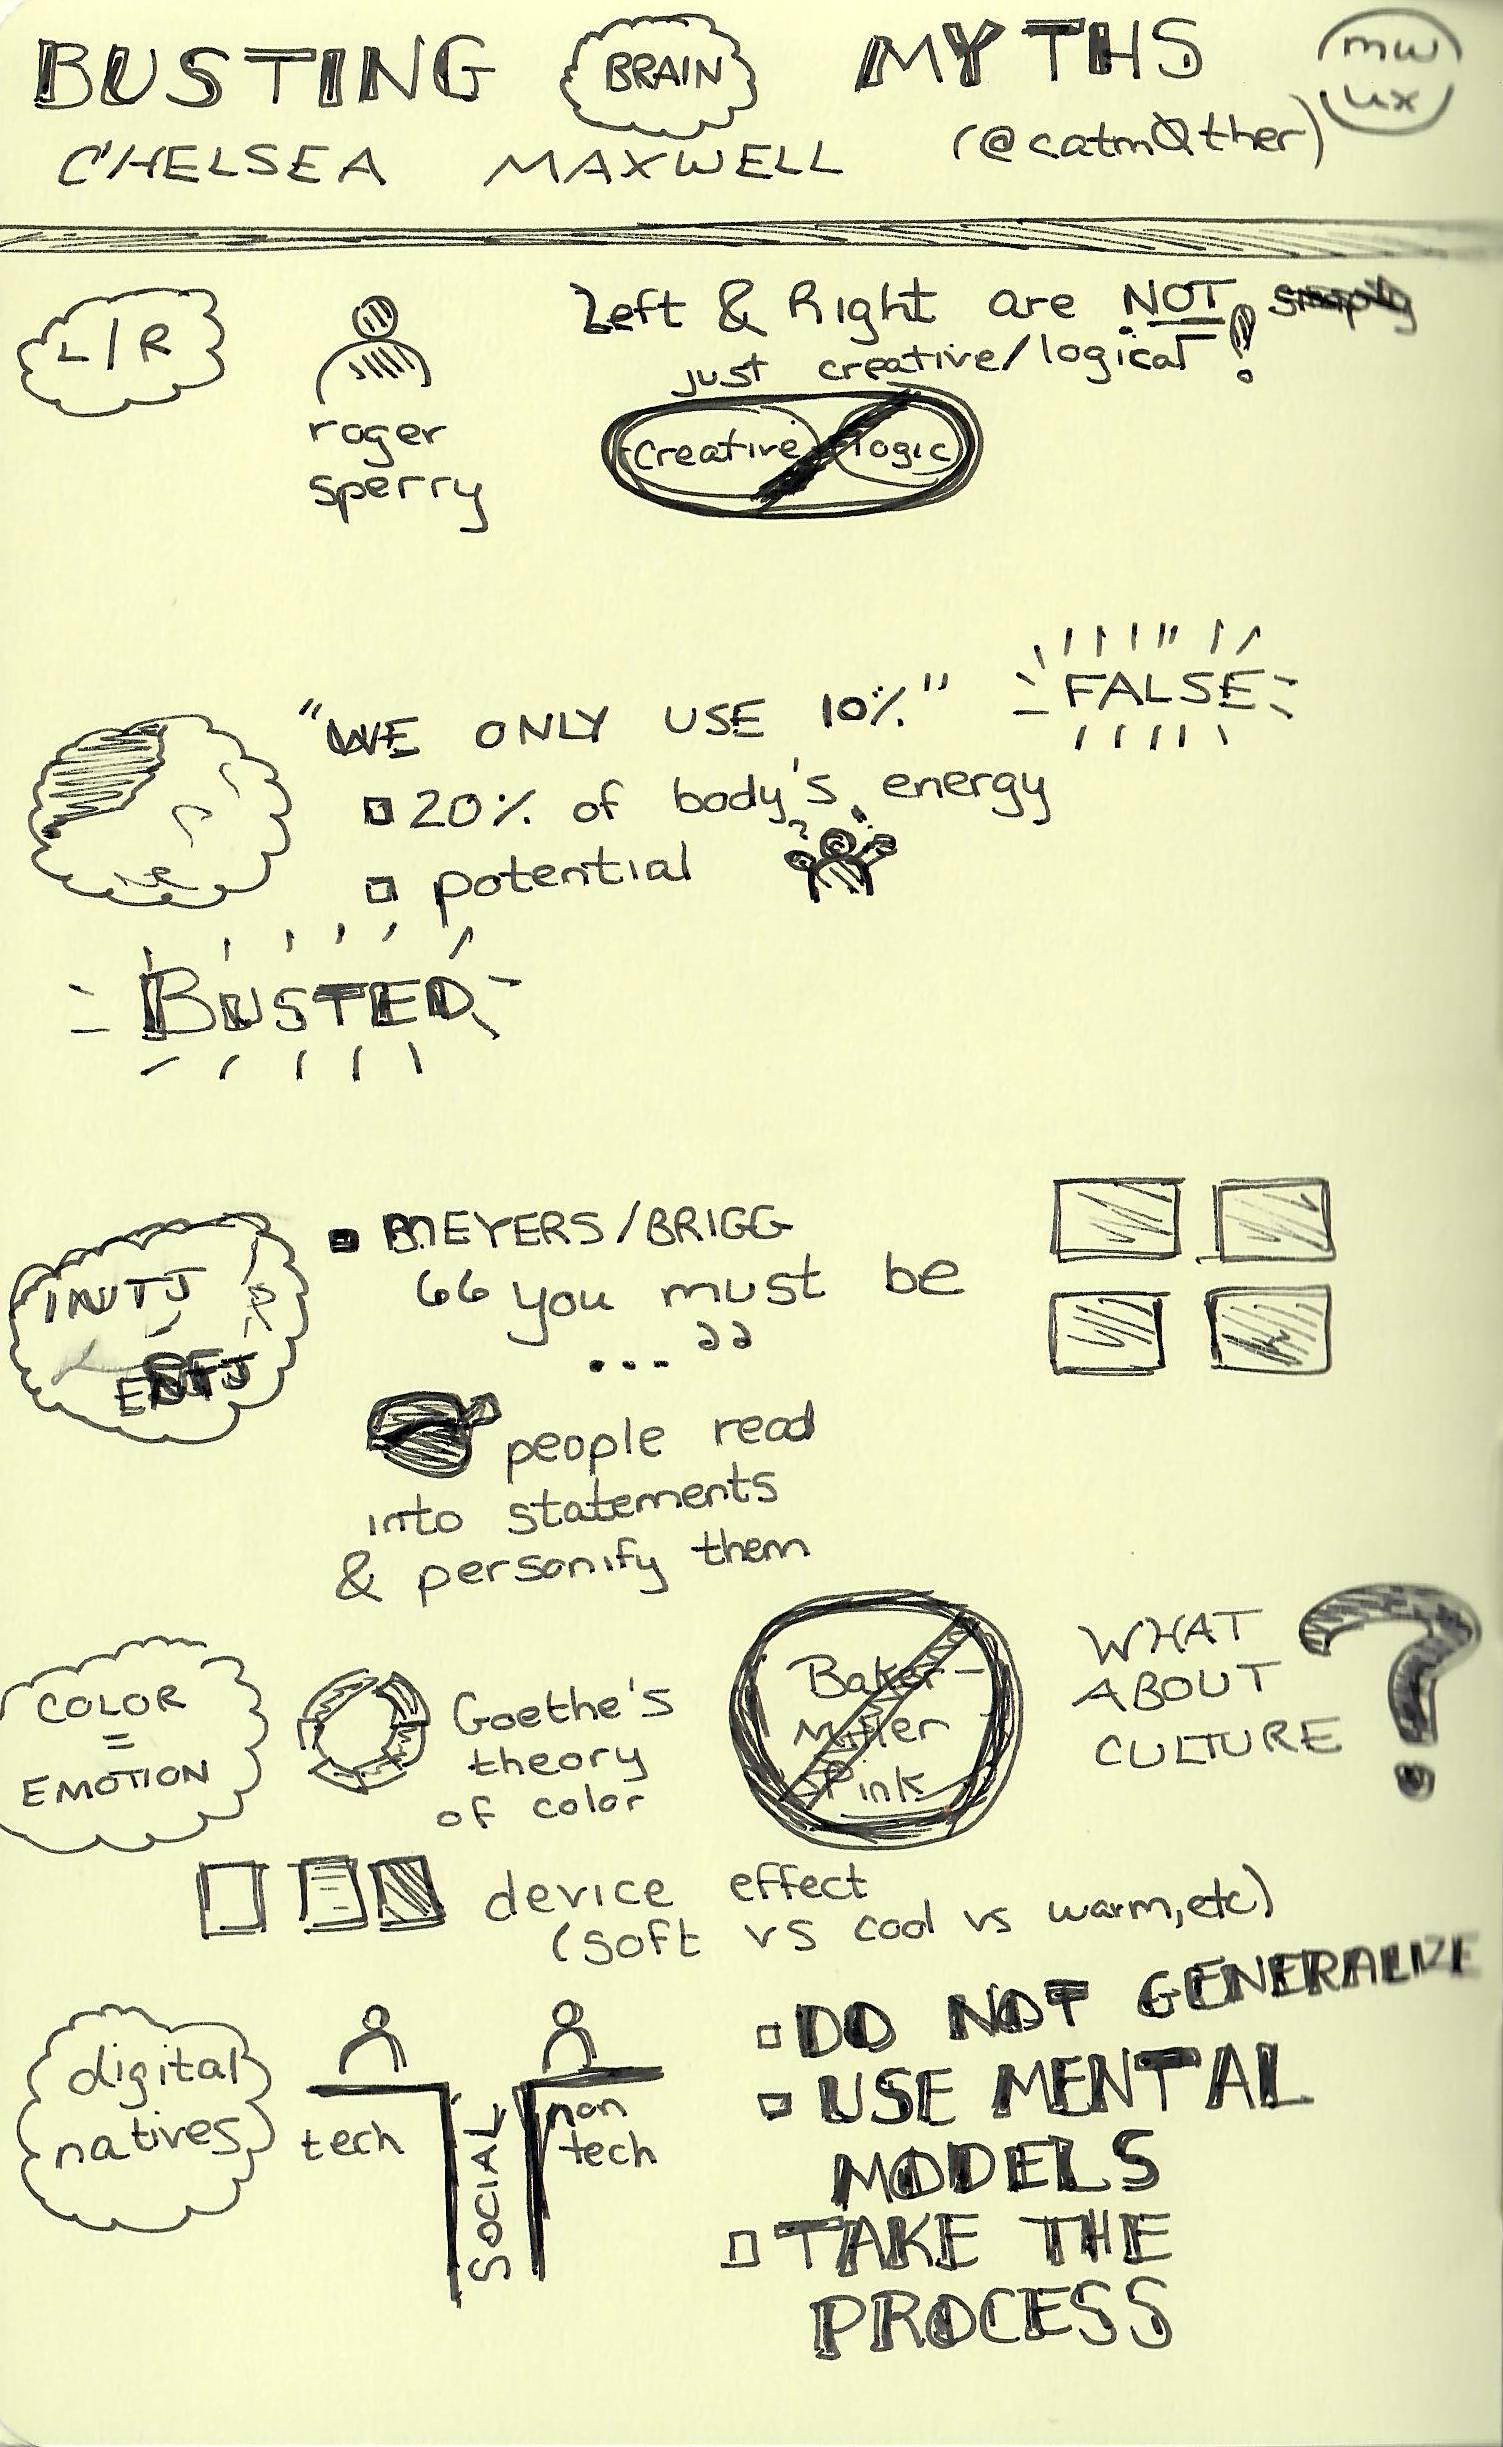 Busting Myths (Chelsea Maxwell).jpg